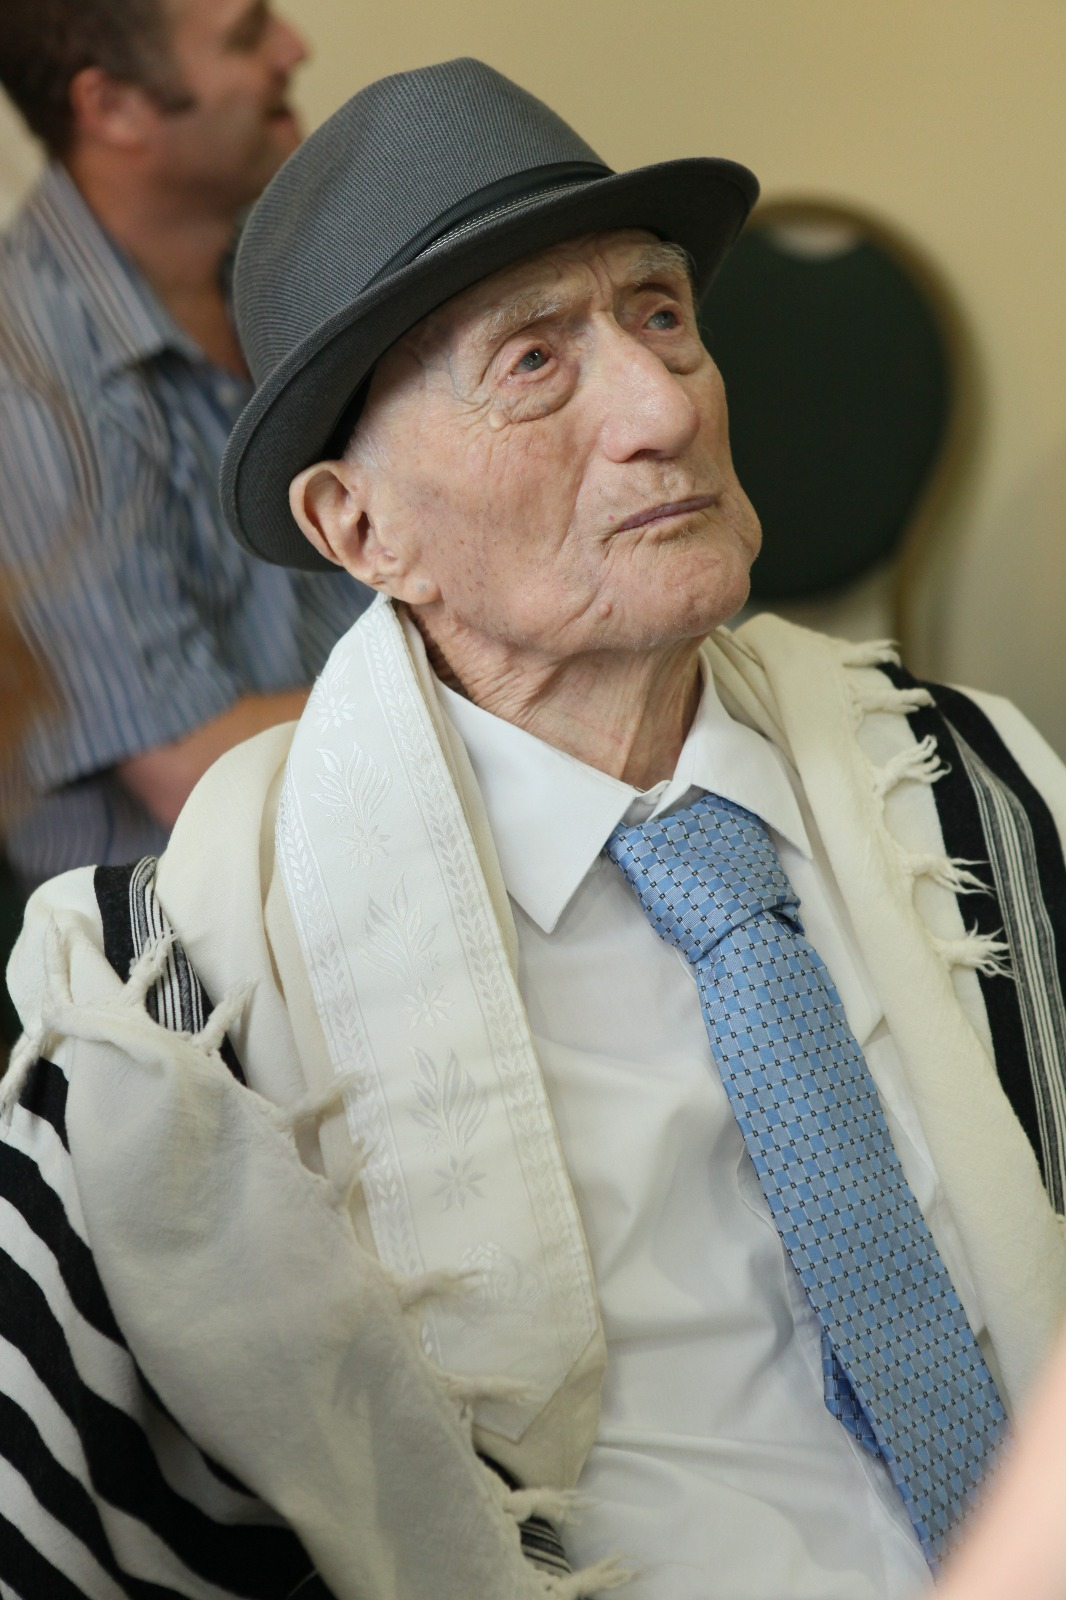 Meghalt a világ legöregebb férfija Izraelben